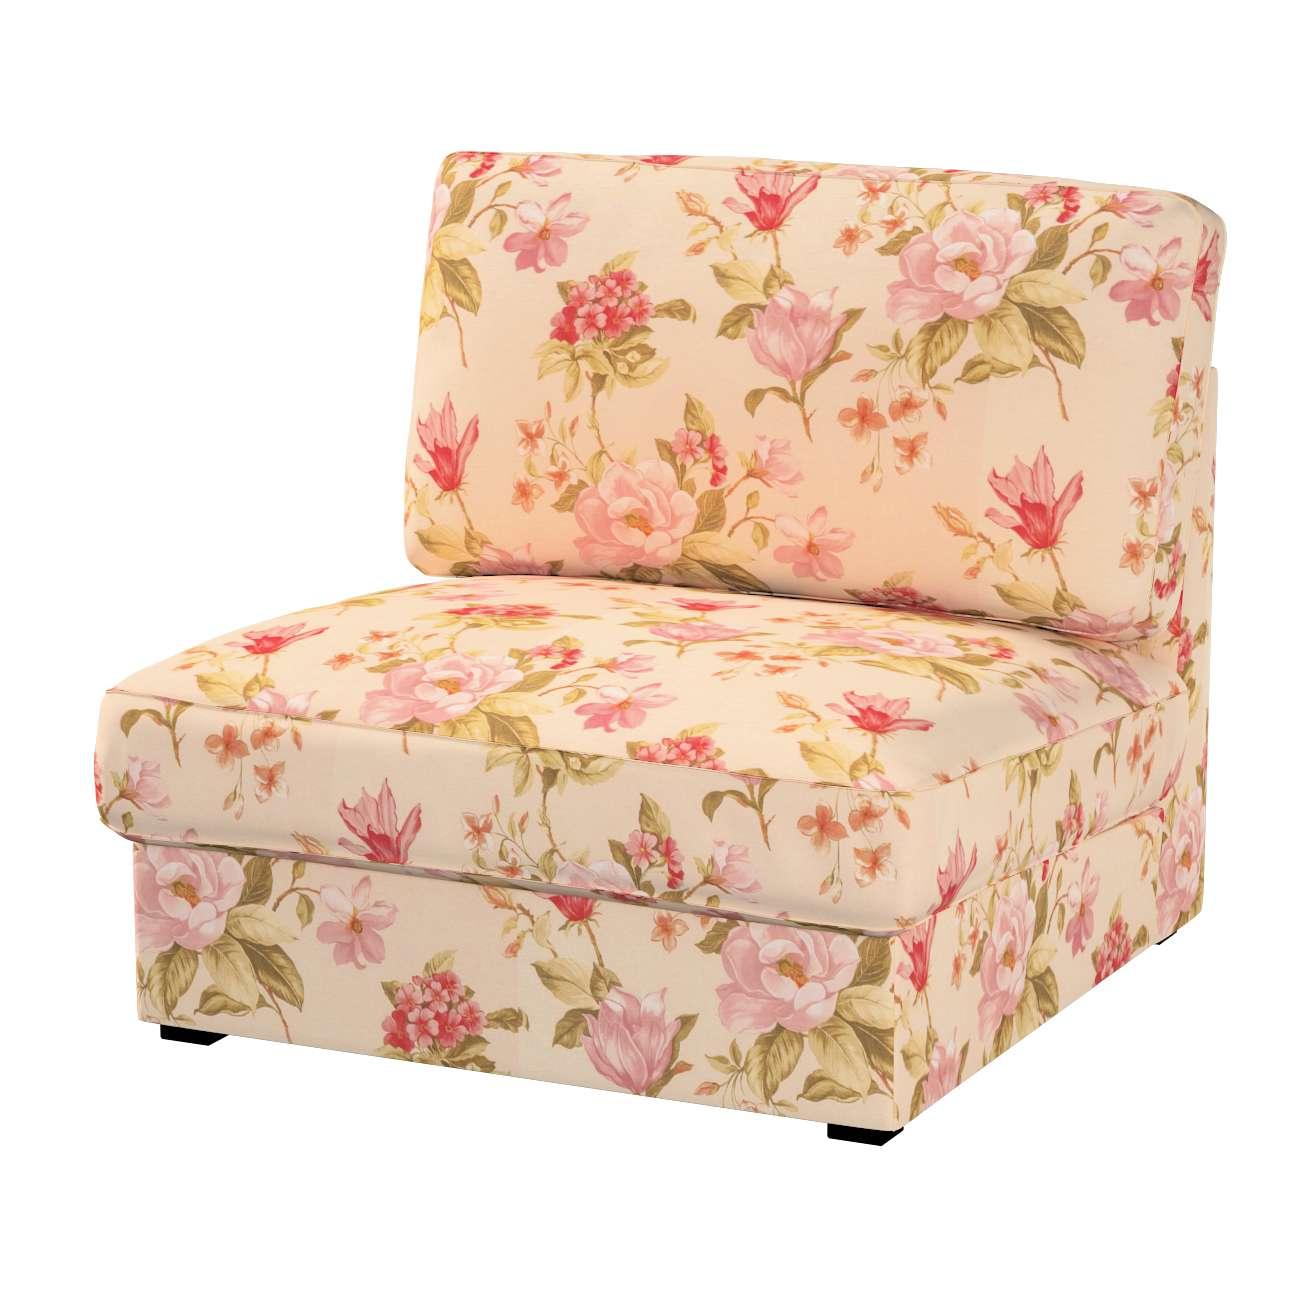 Pokrowiec na fotel Kivik Fotel Kivik w kolekcji Londres, tkanina: 123-05